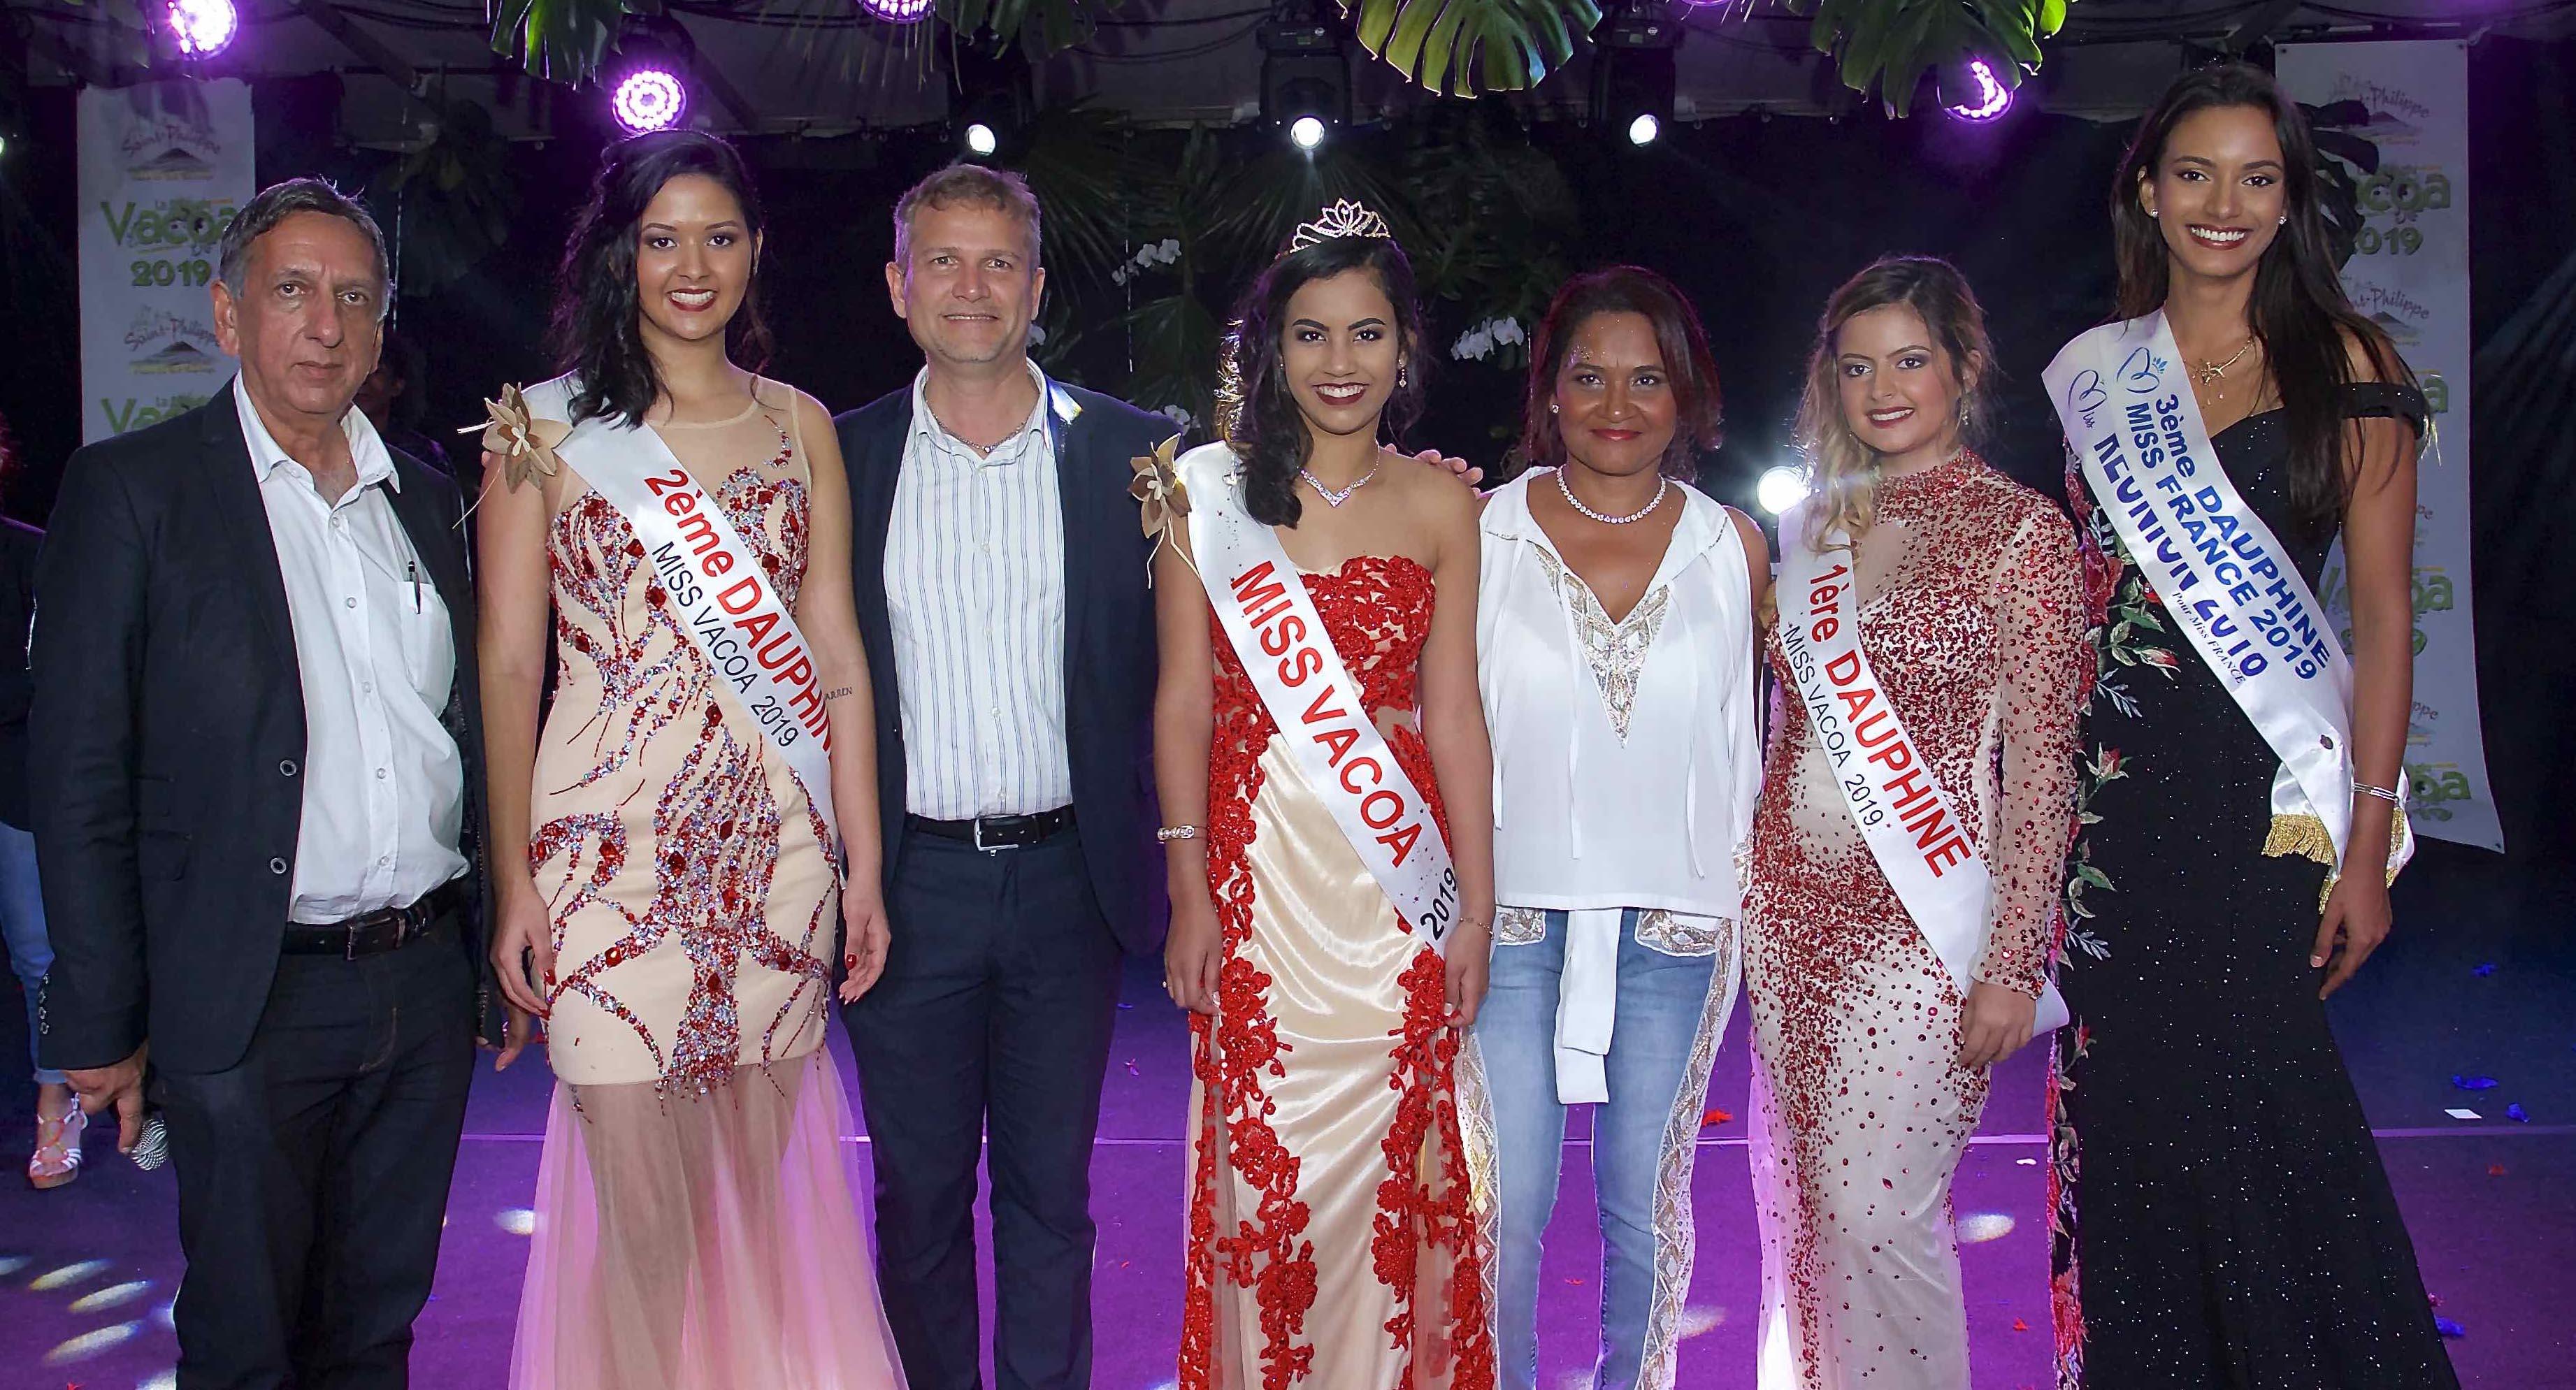 Aziz Patel, Gwendoline Fontaine, Olivier Rivière, Frideline Mouniama, Michèle Payet, Flora Olivar, et Morgane Soucramanien